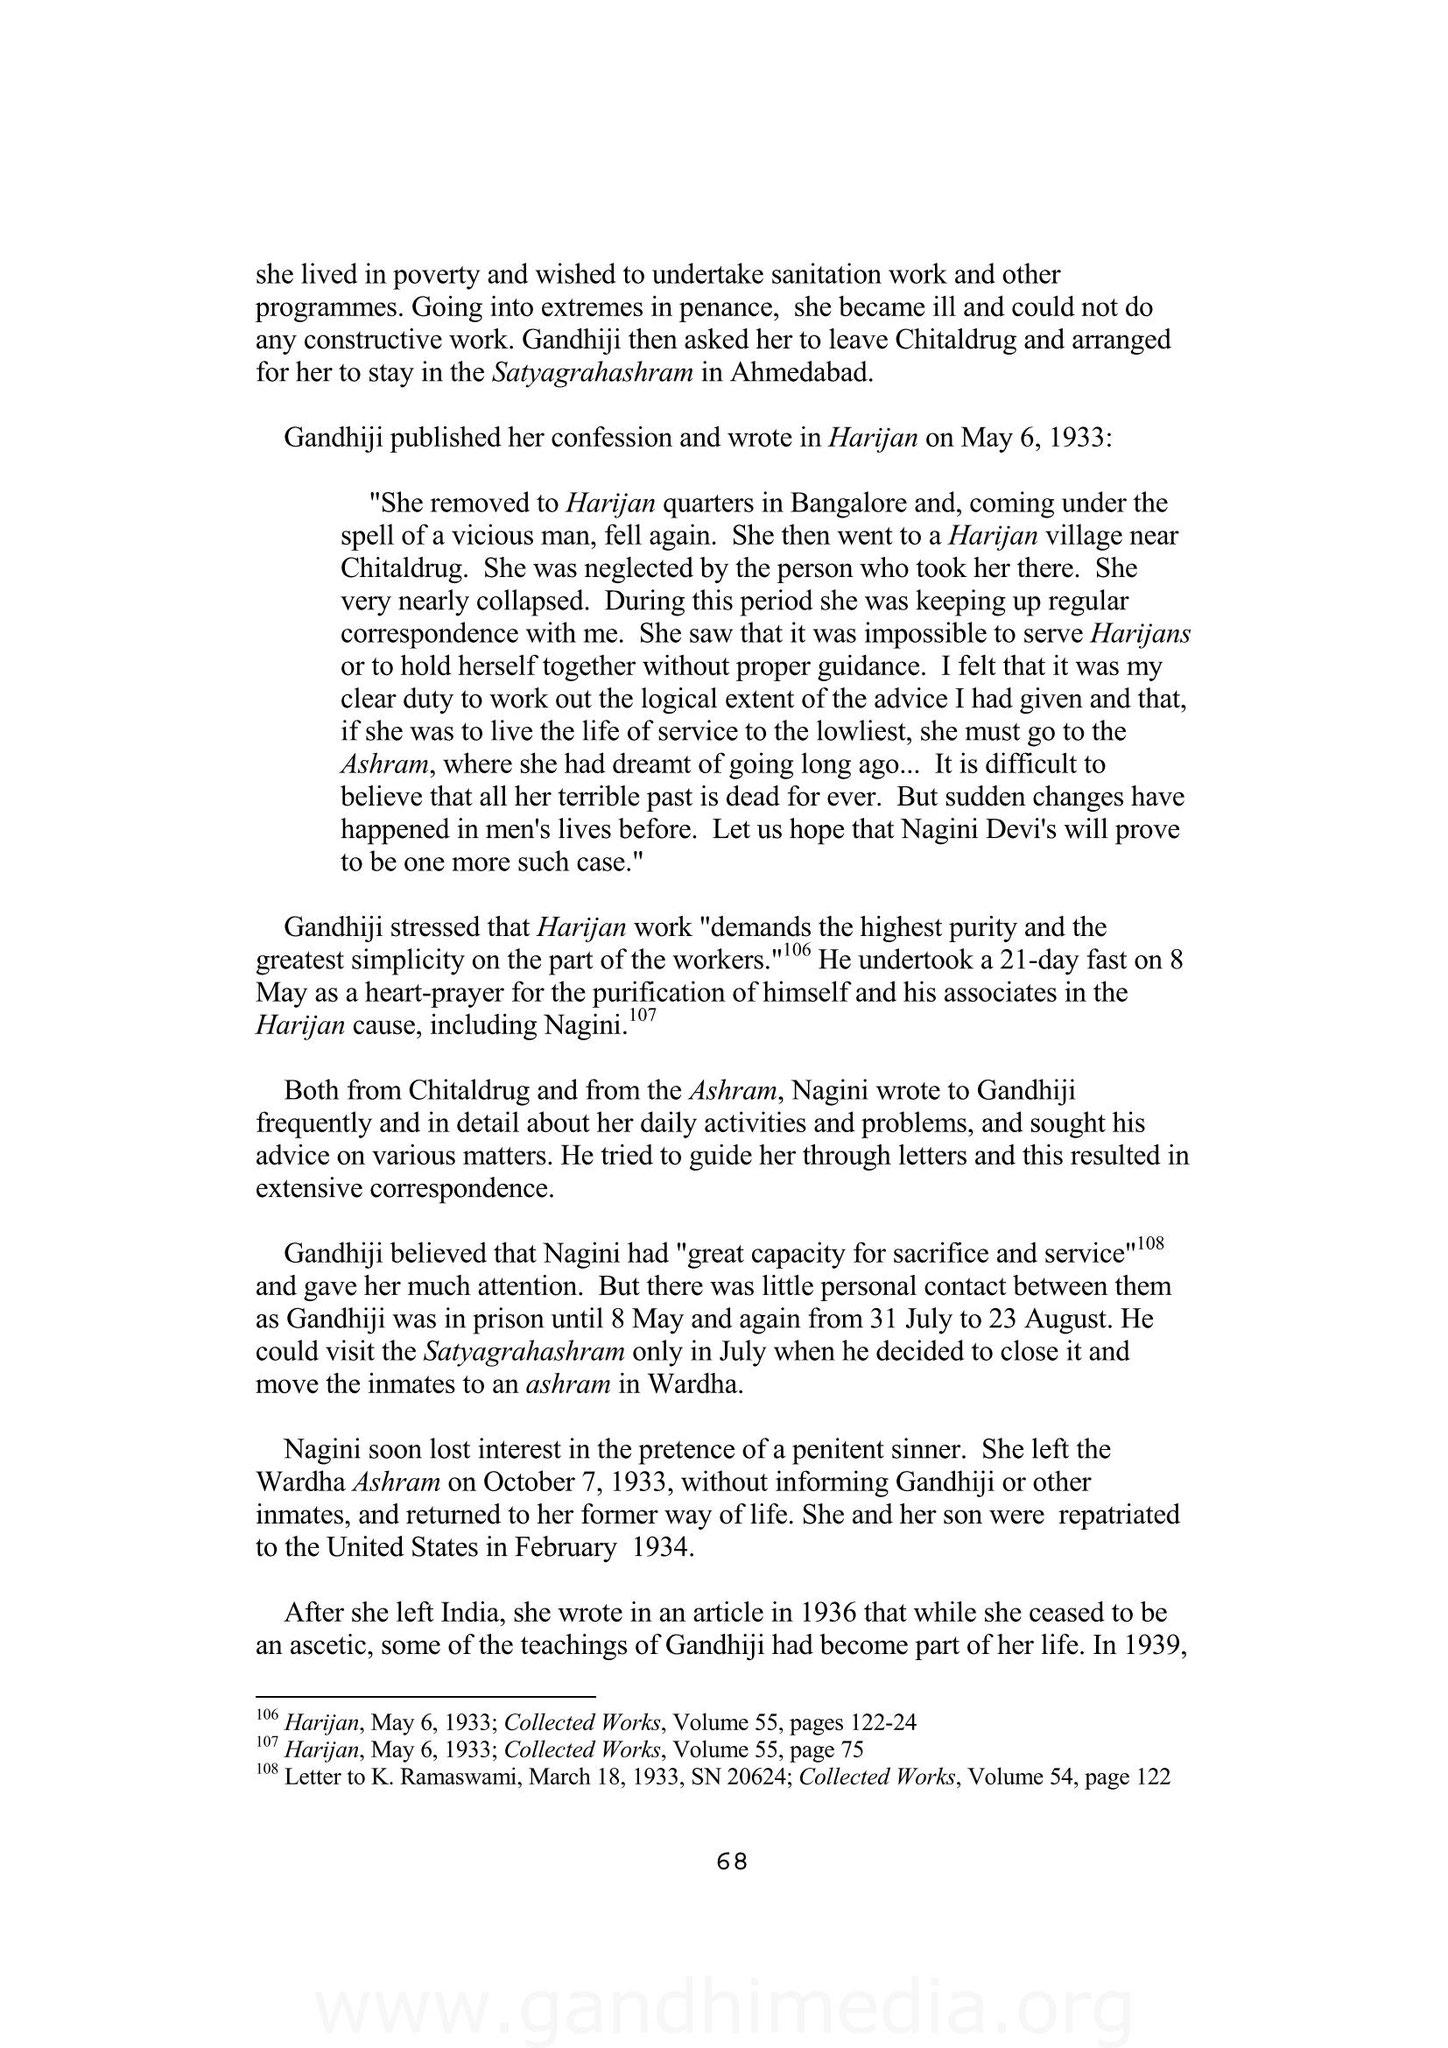 Letters to Americans - GandhiServe Foundation